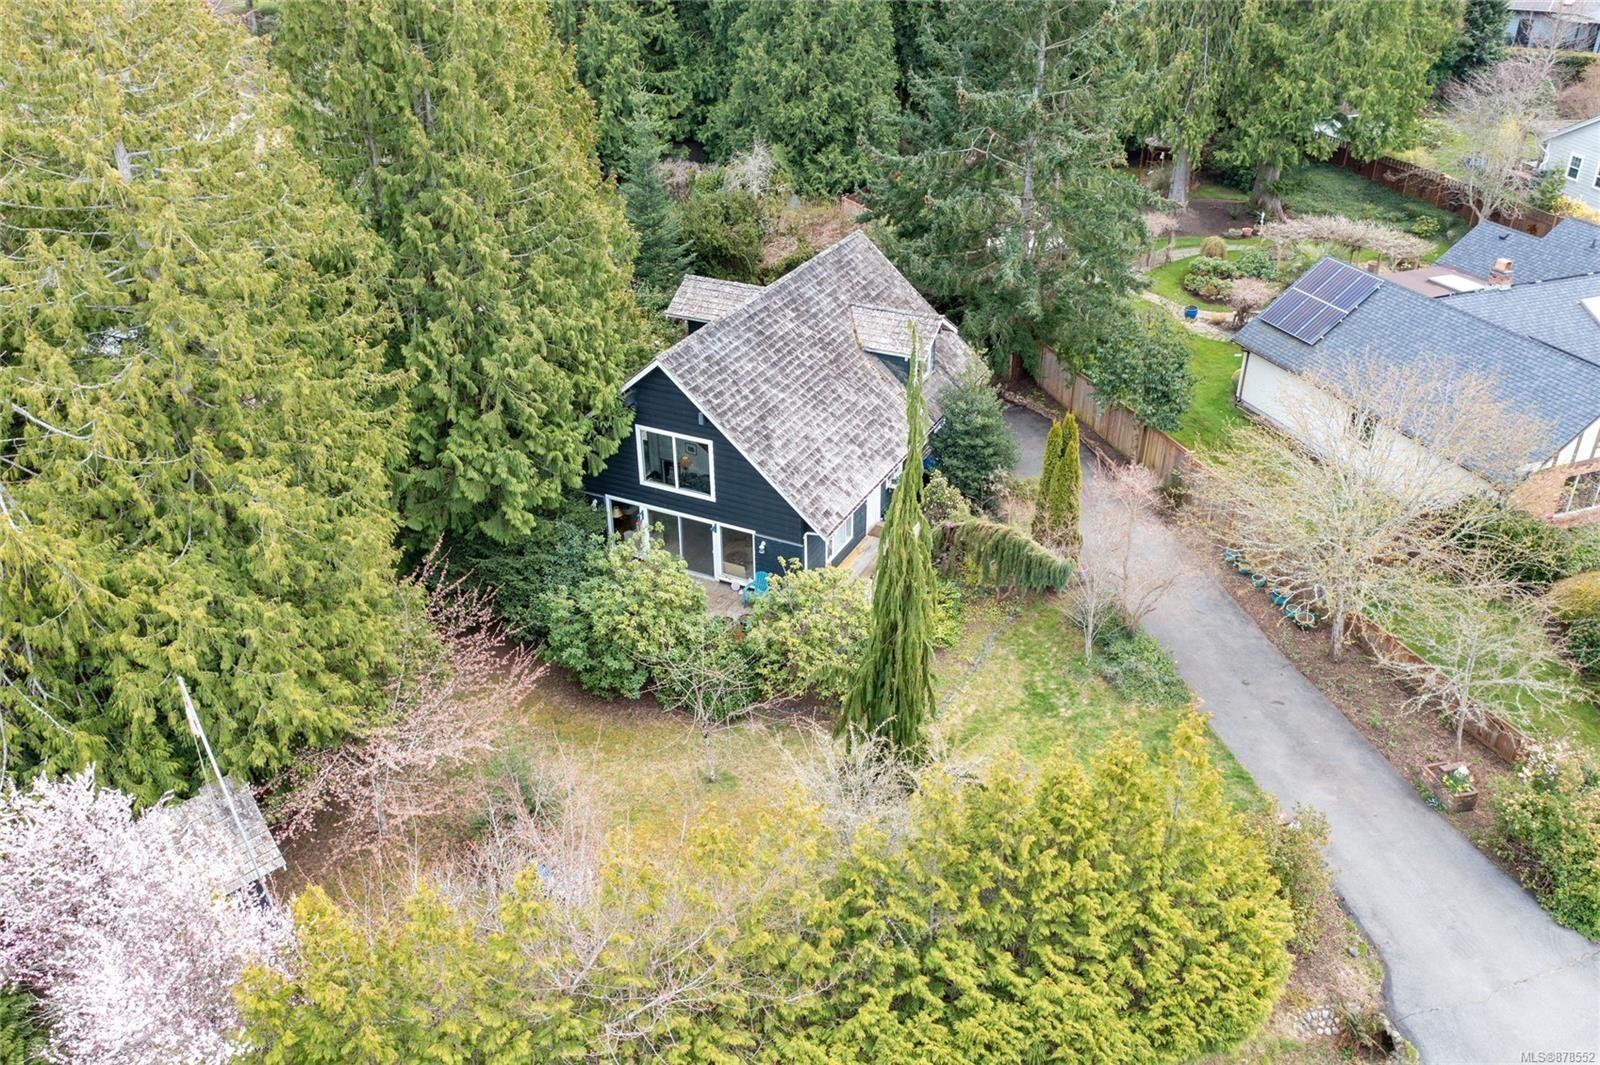 Main Photo: 1086 Harlequin Rd in : PQ Qualicum Beach House for sale (Parksville/Qualicum)  : MLS®# 878552